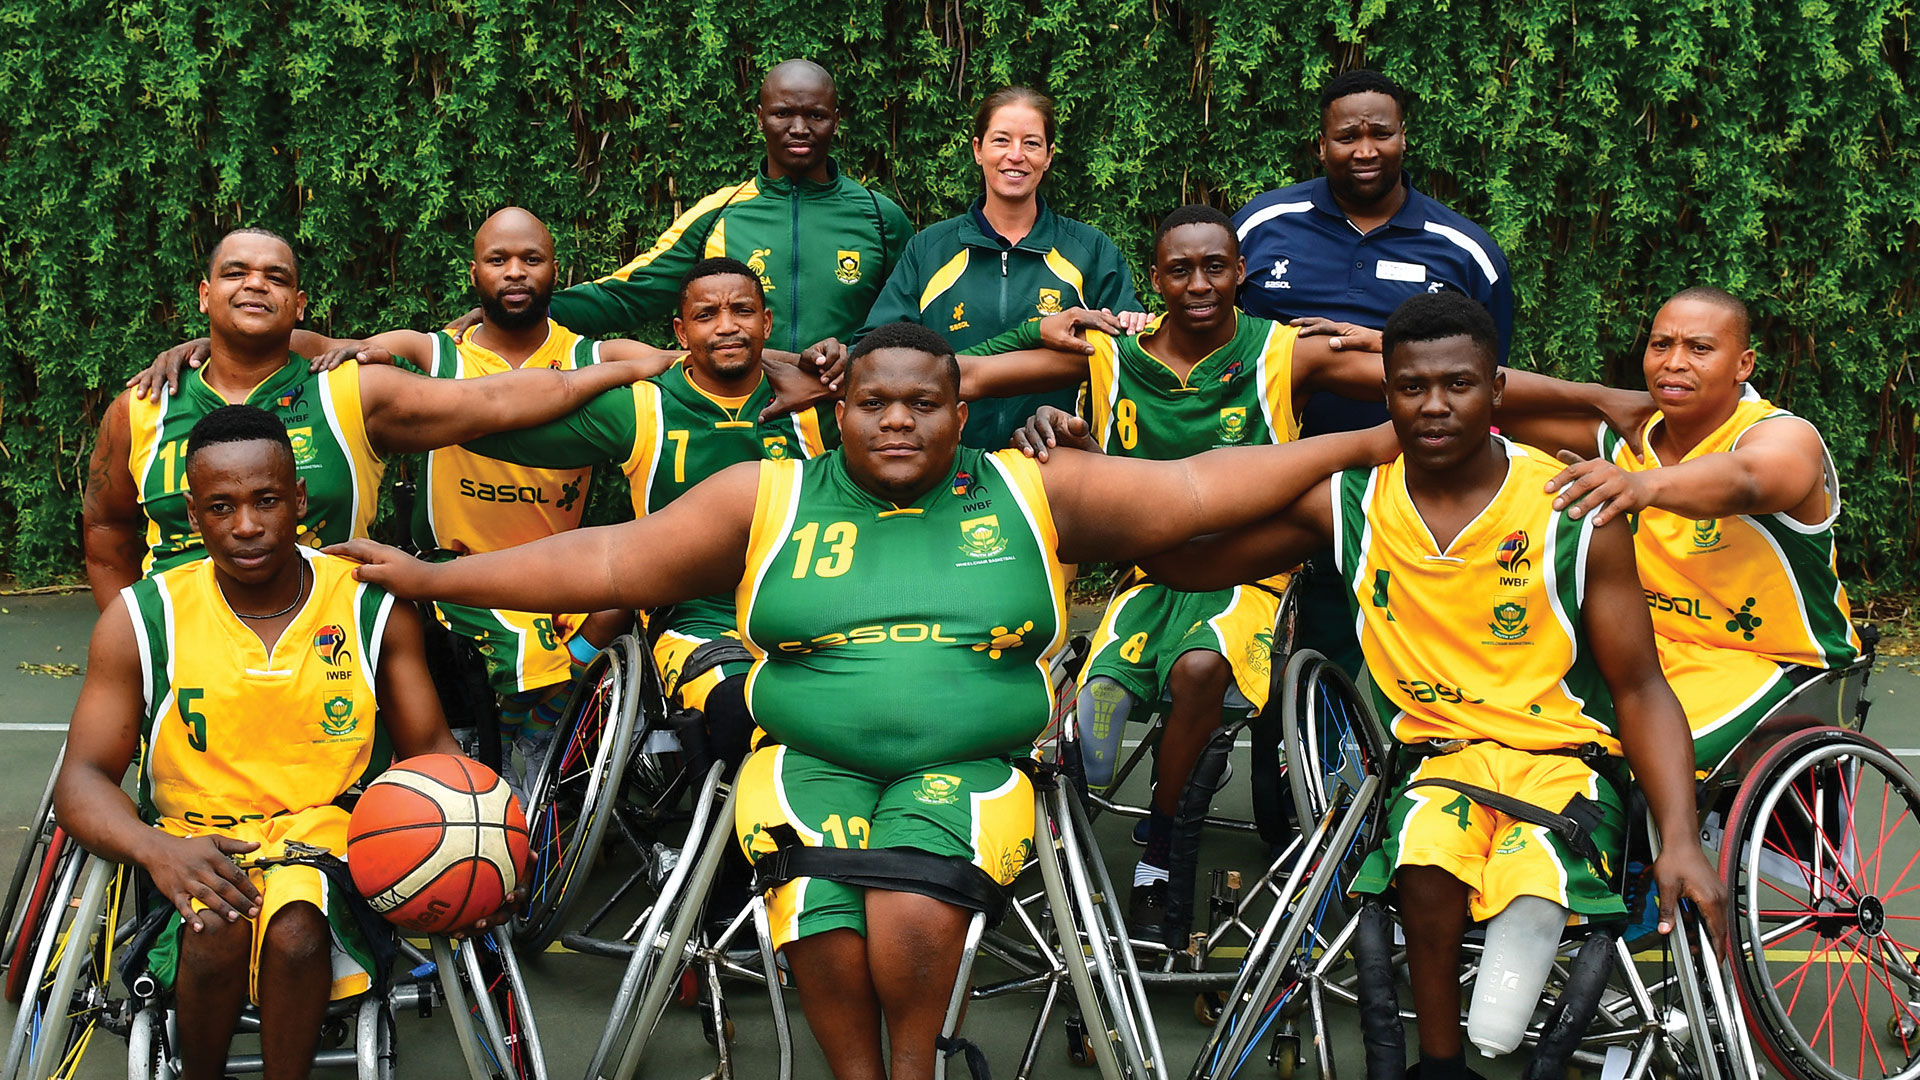 Sasol Amawheela Boys team